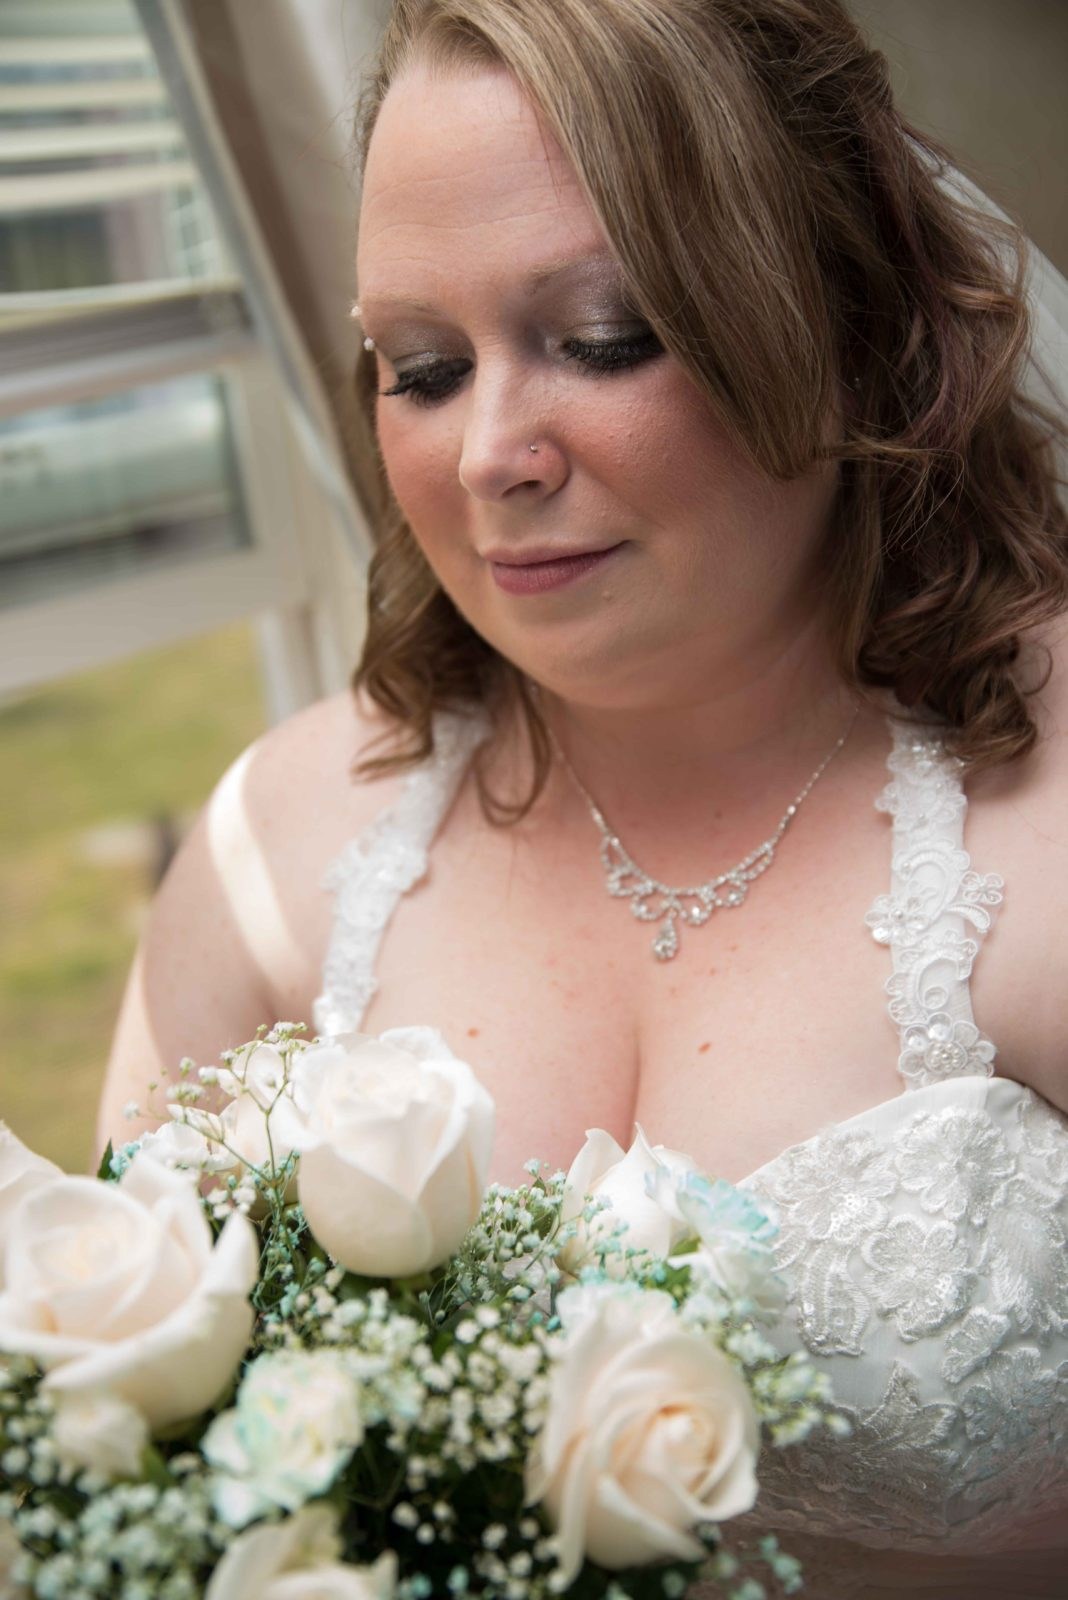 David and Alicia Wedding - Your Journey Studios